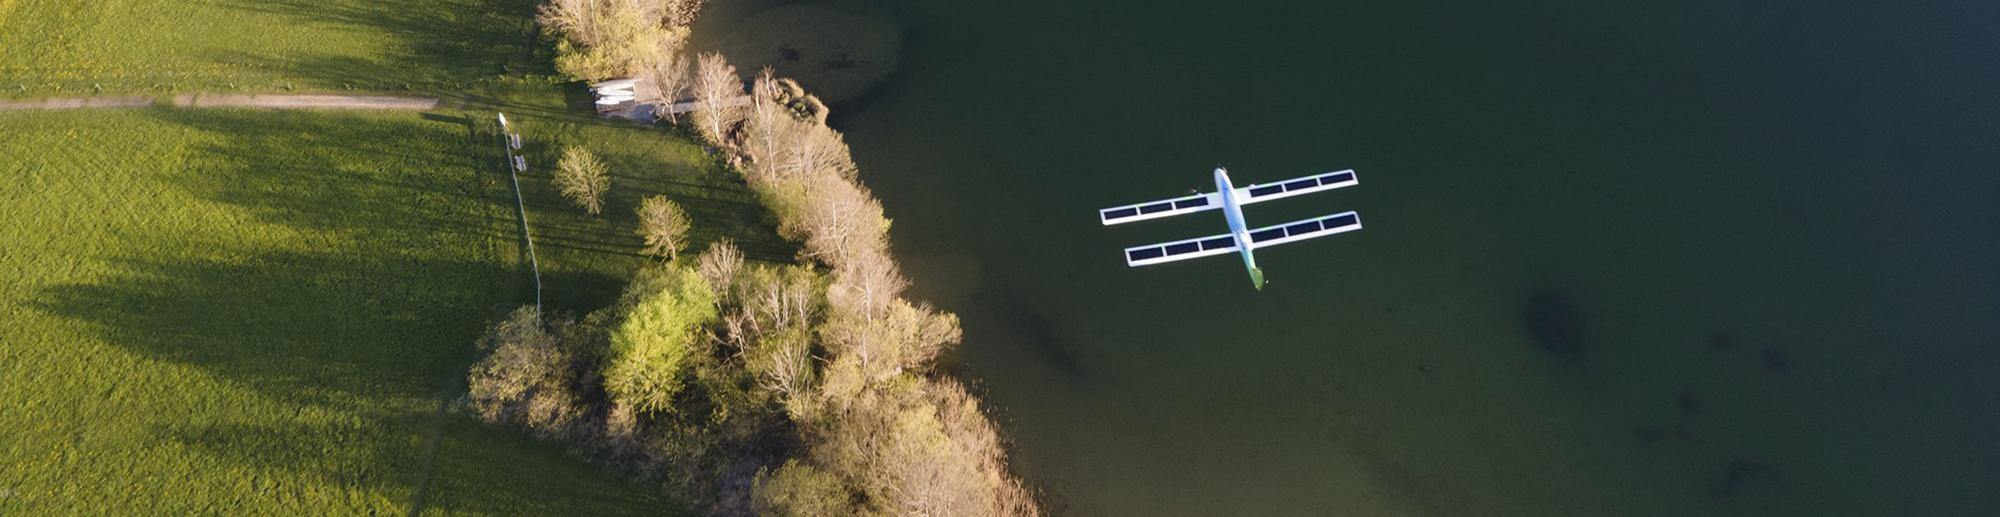 Dron solar motor brushless maxon